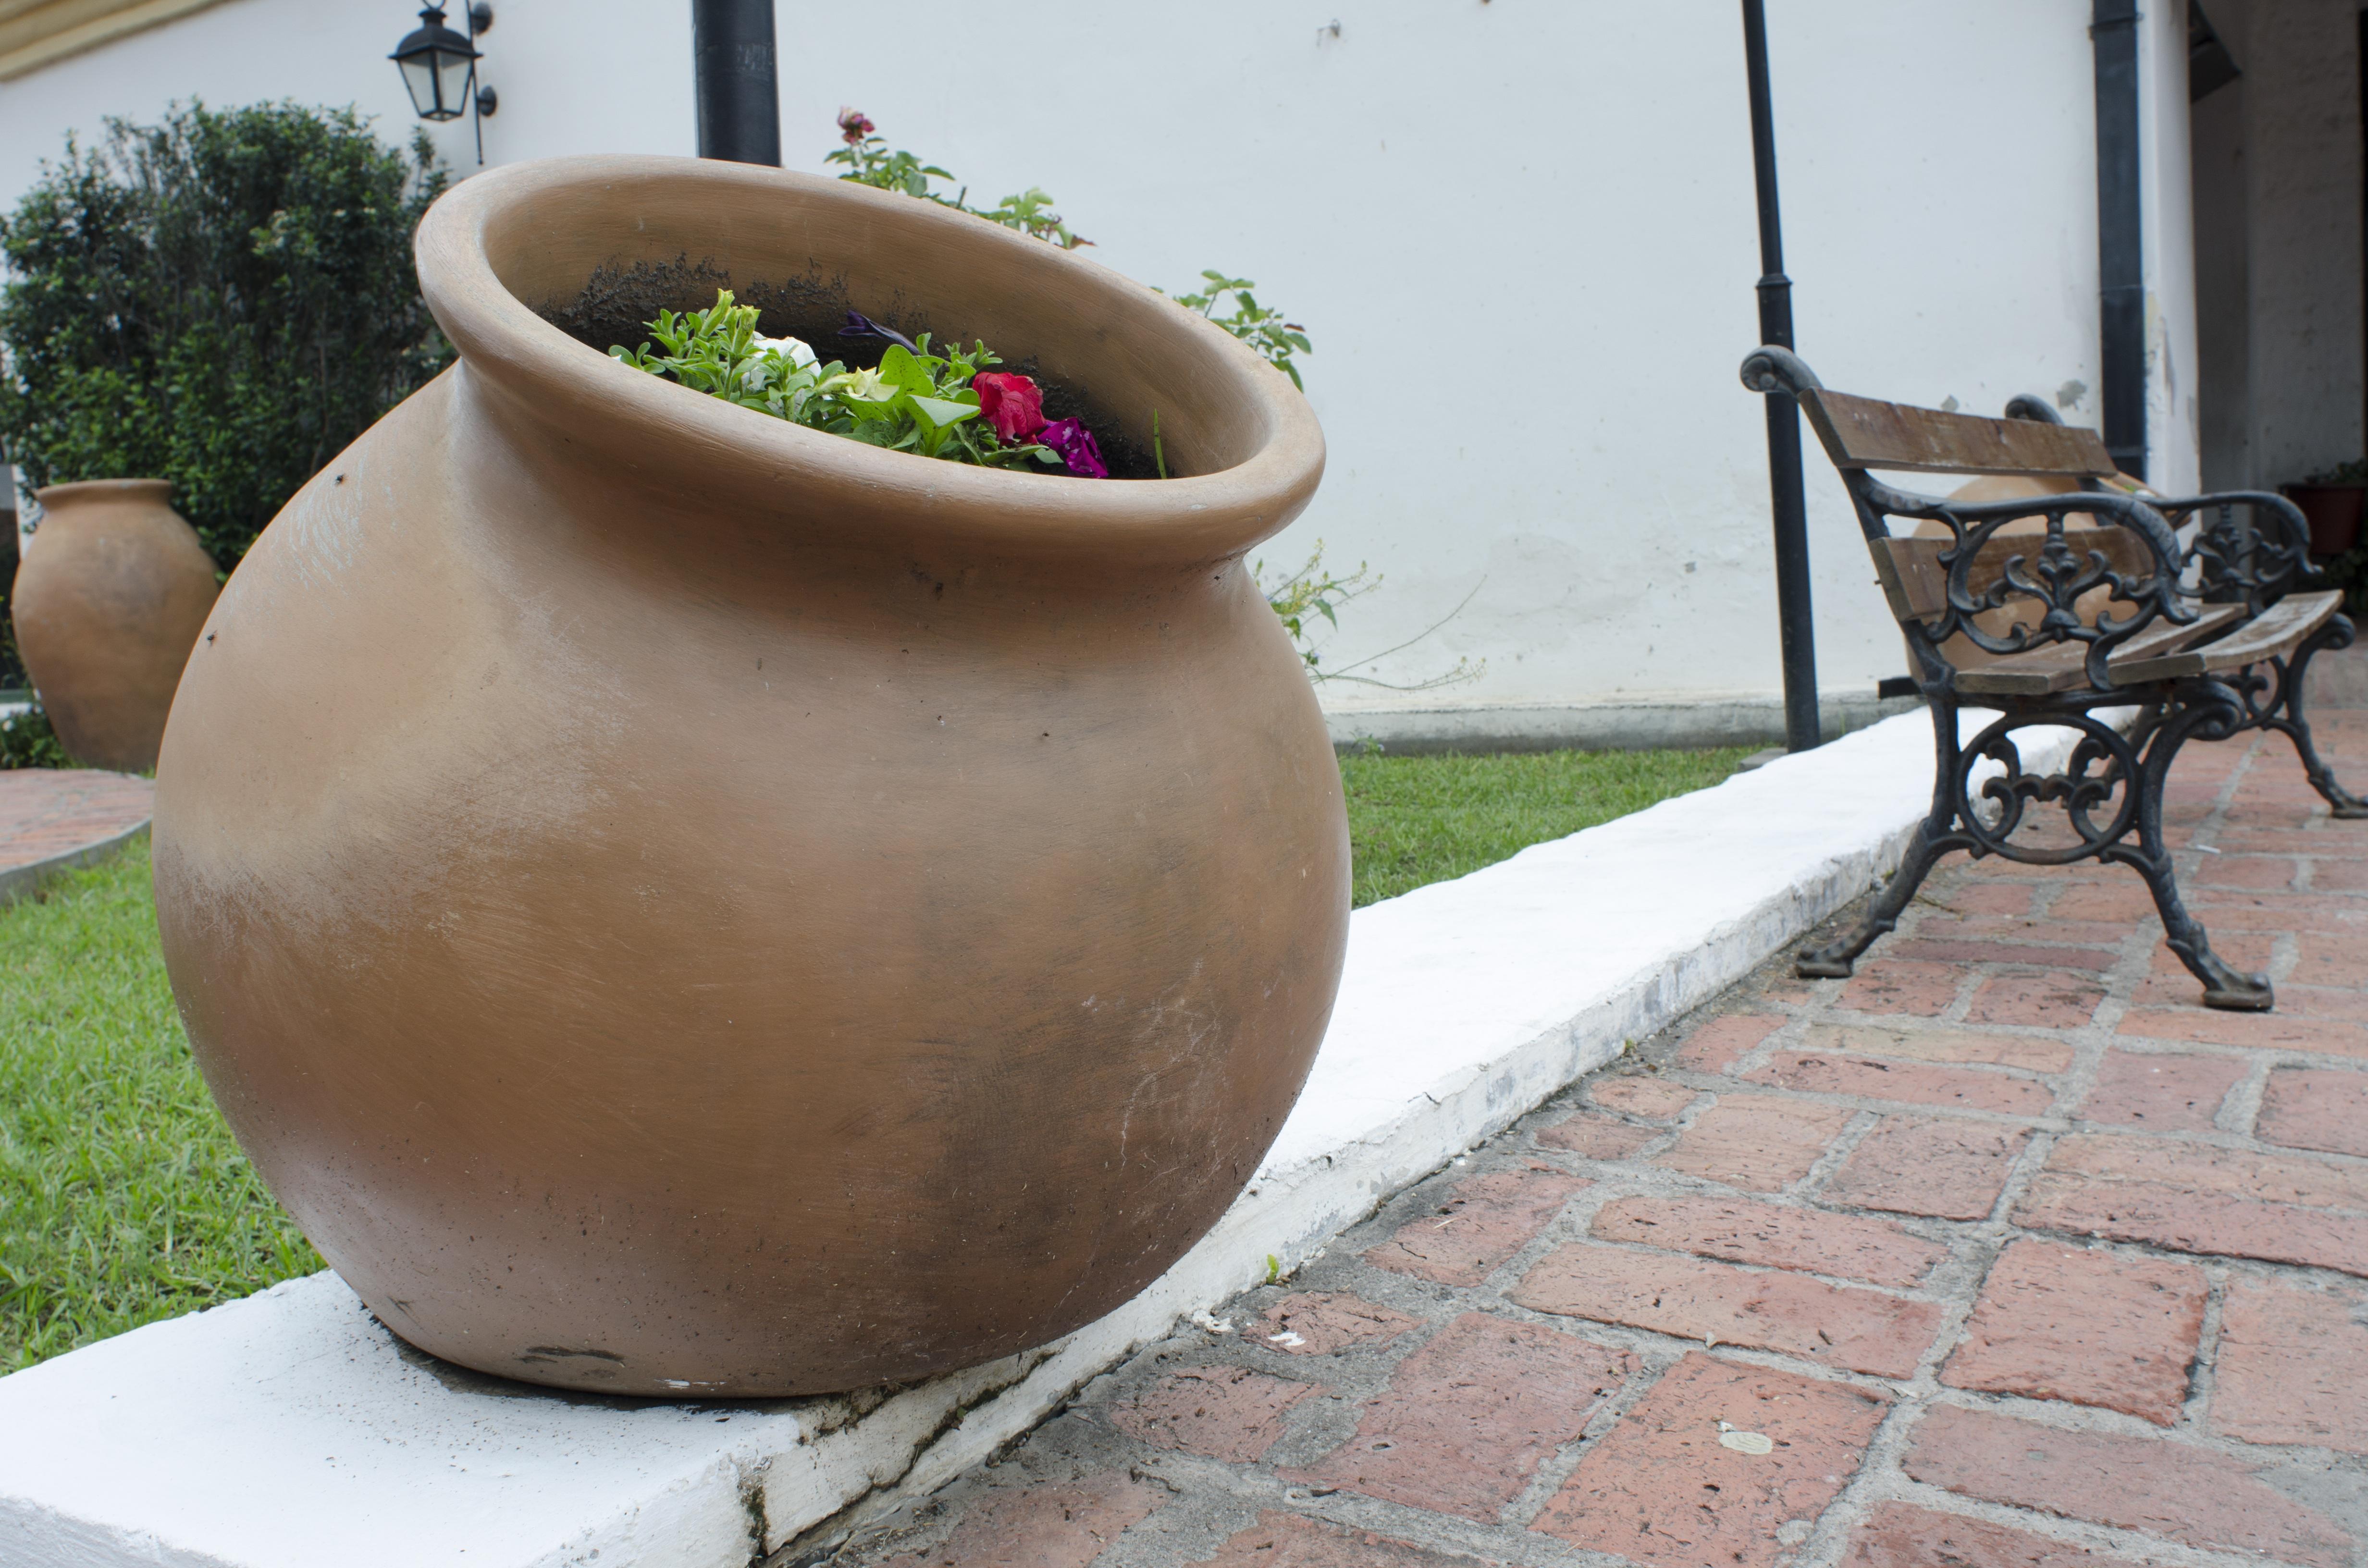 Keramik Kunst Für Den Garten kostenlose foto : rad, keramik, hinterhof, garten, kunst, krug, topf